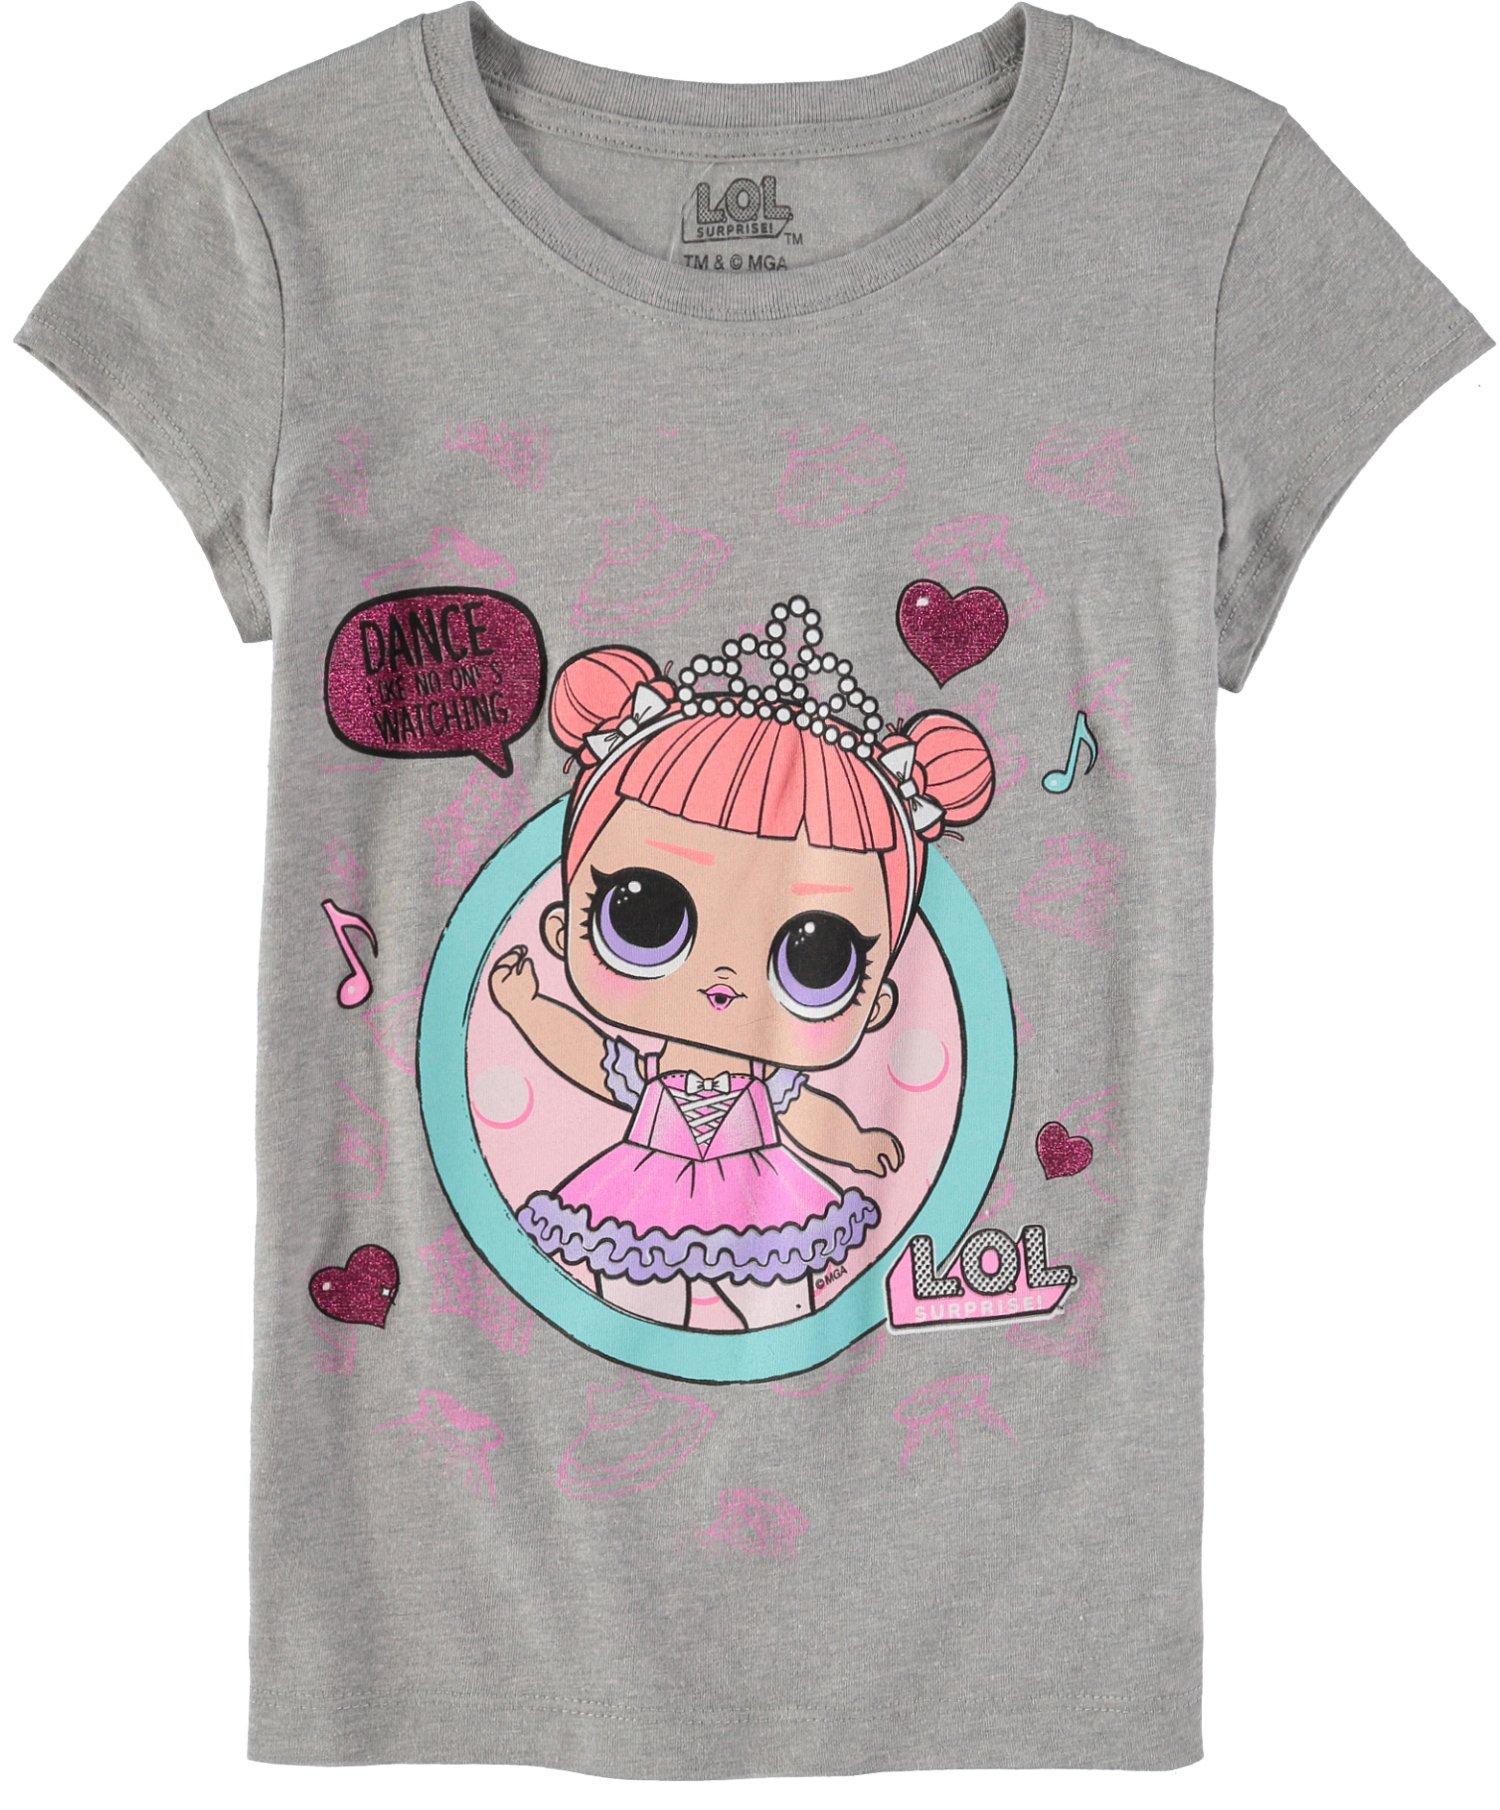 ce26885c93c5 L.O.L. Surprise! Girls' Short-Sleeve T-Shirt 4-Pack - Toys